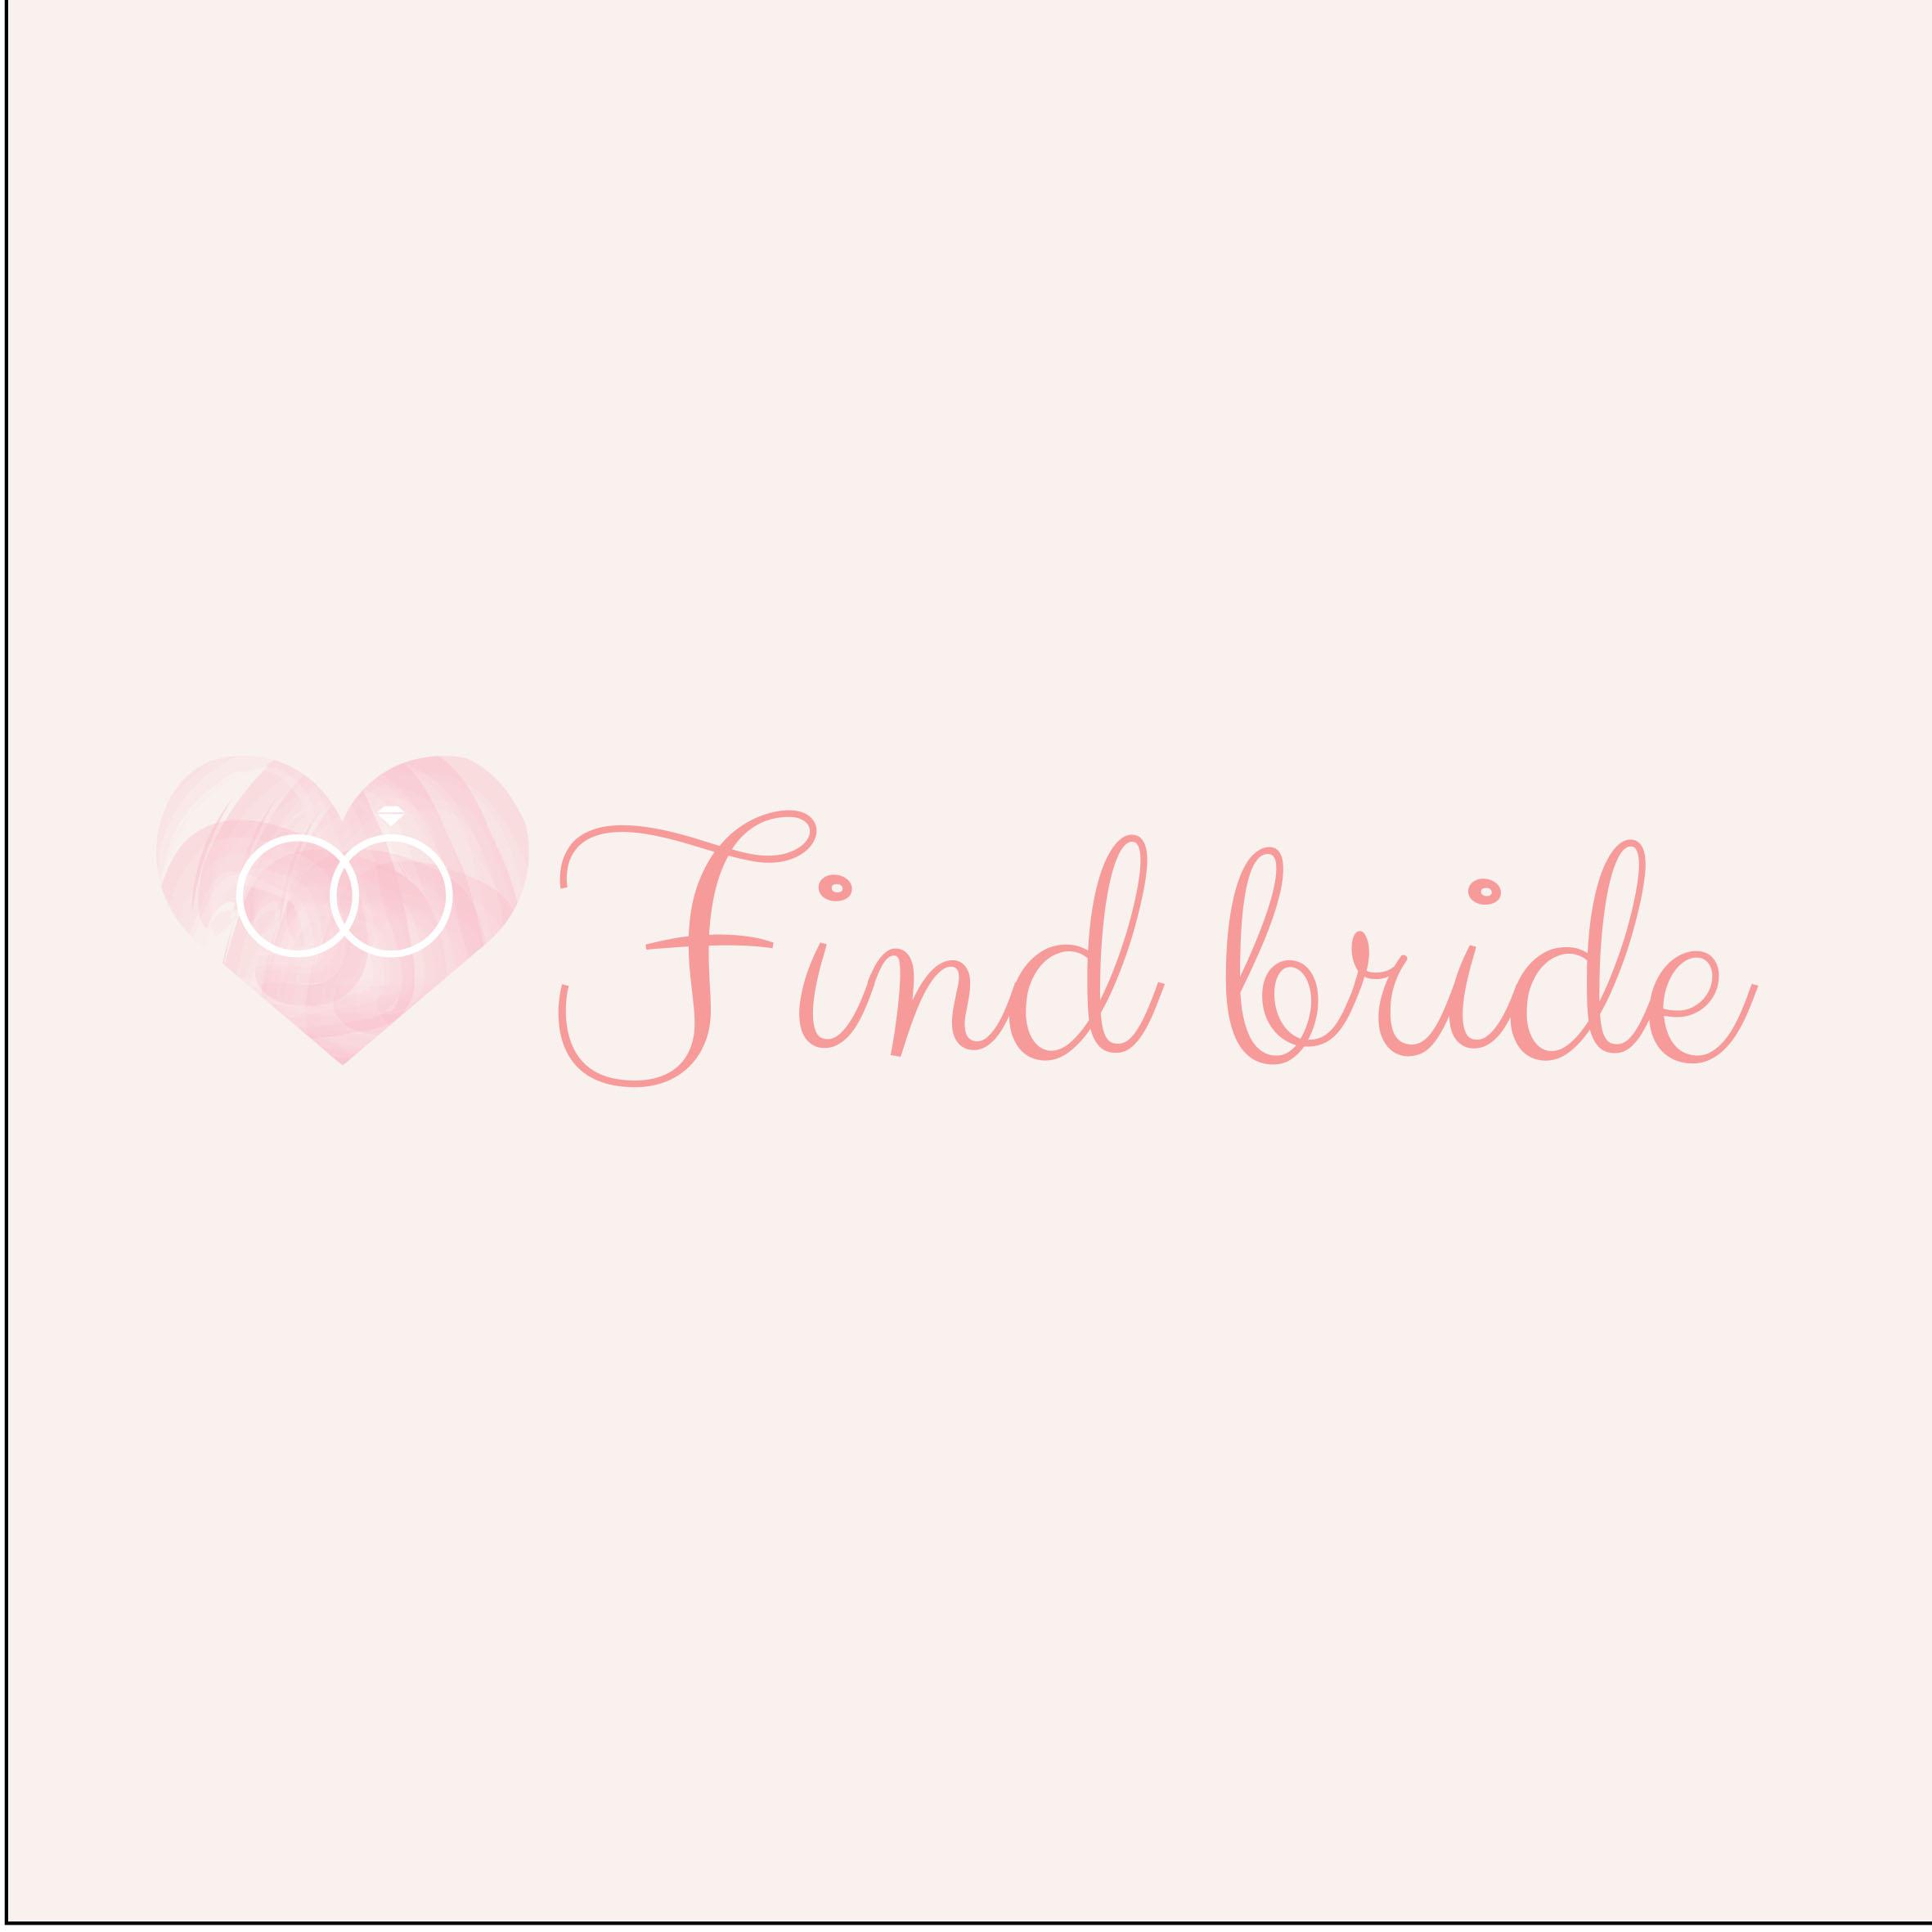 Нарисовать логотип сайта знакомств фото f_1805ace5788a911a.jpg